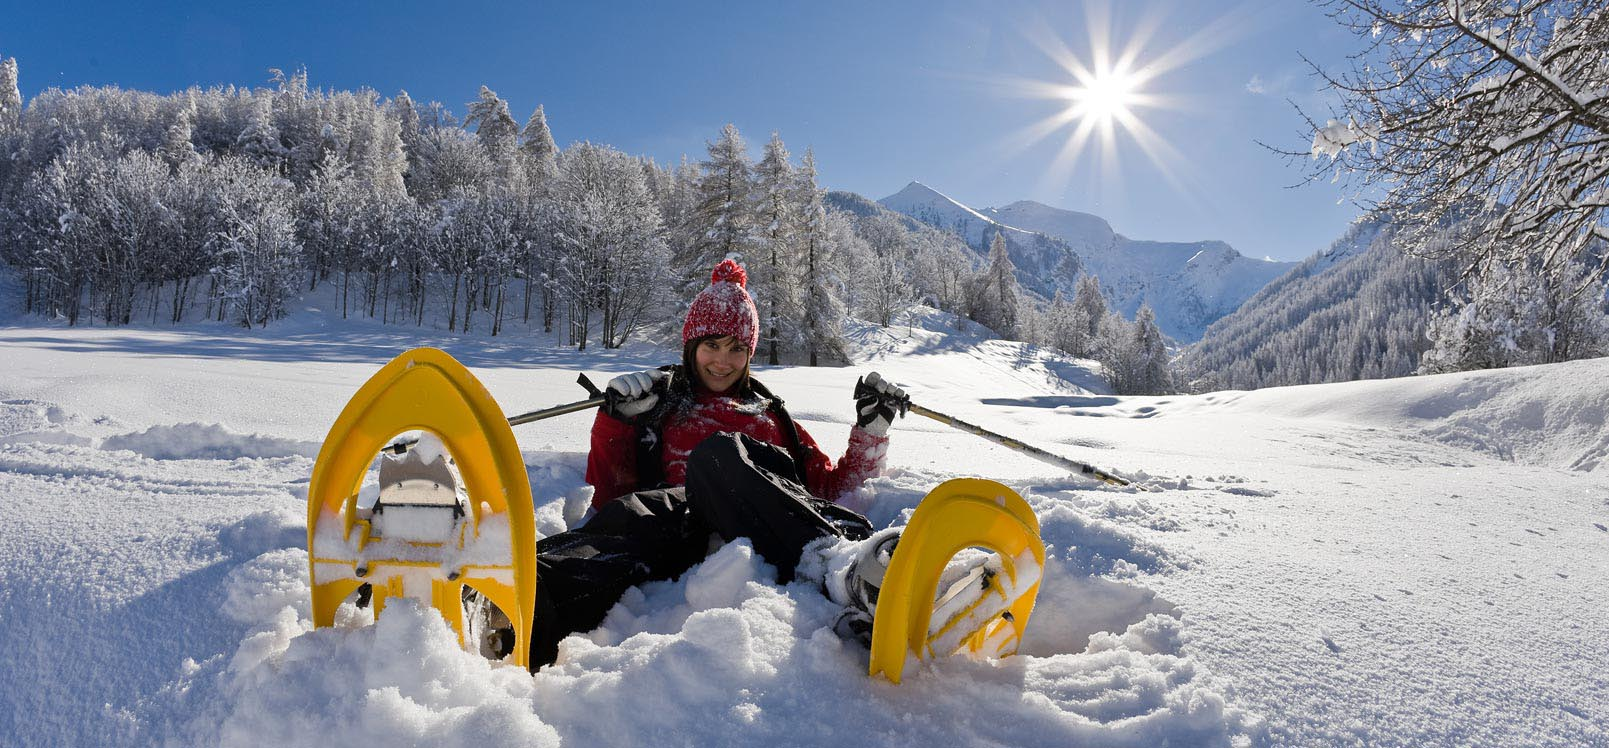 Ski nordique ski de fond Hautes-Alpes